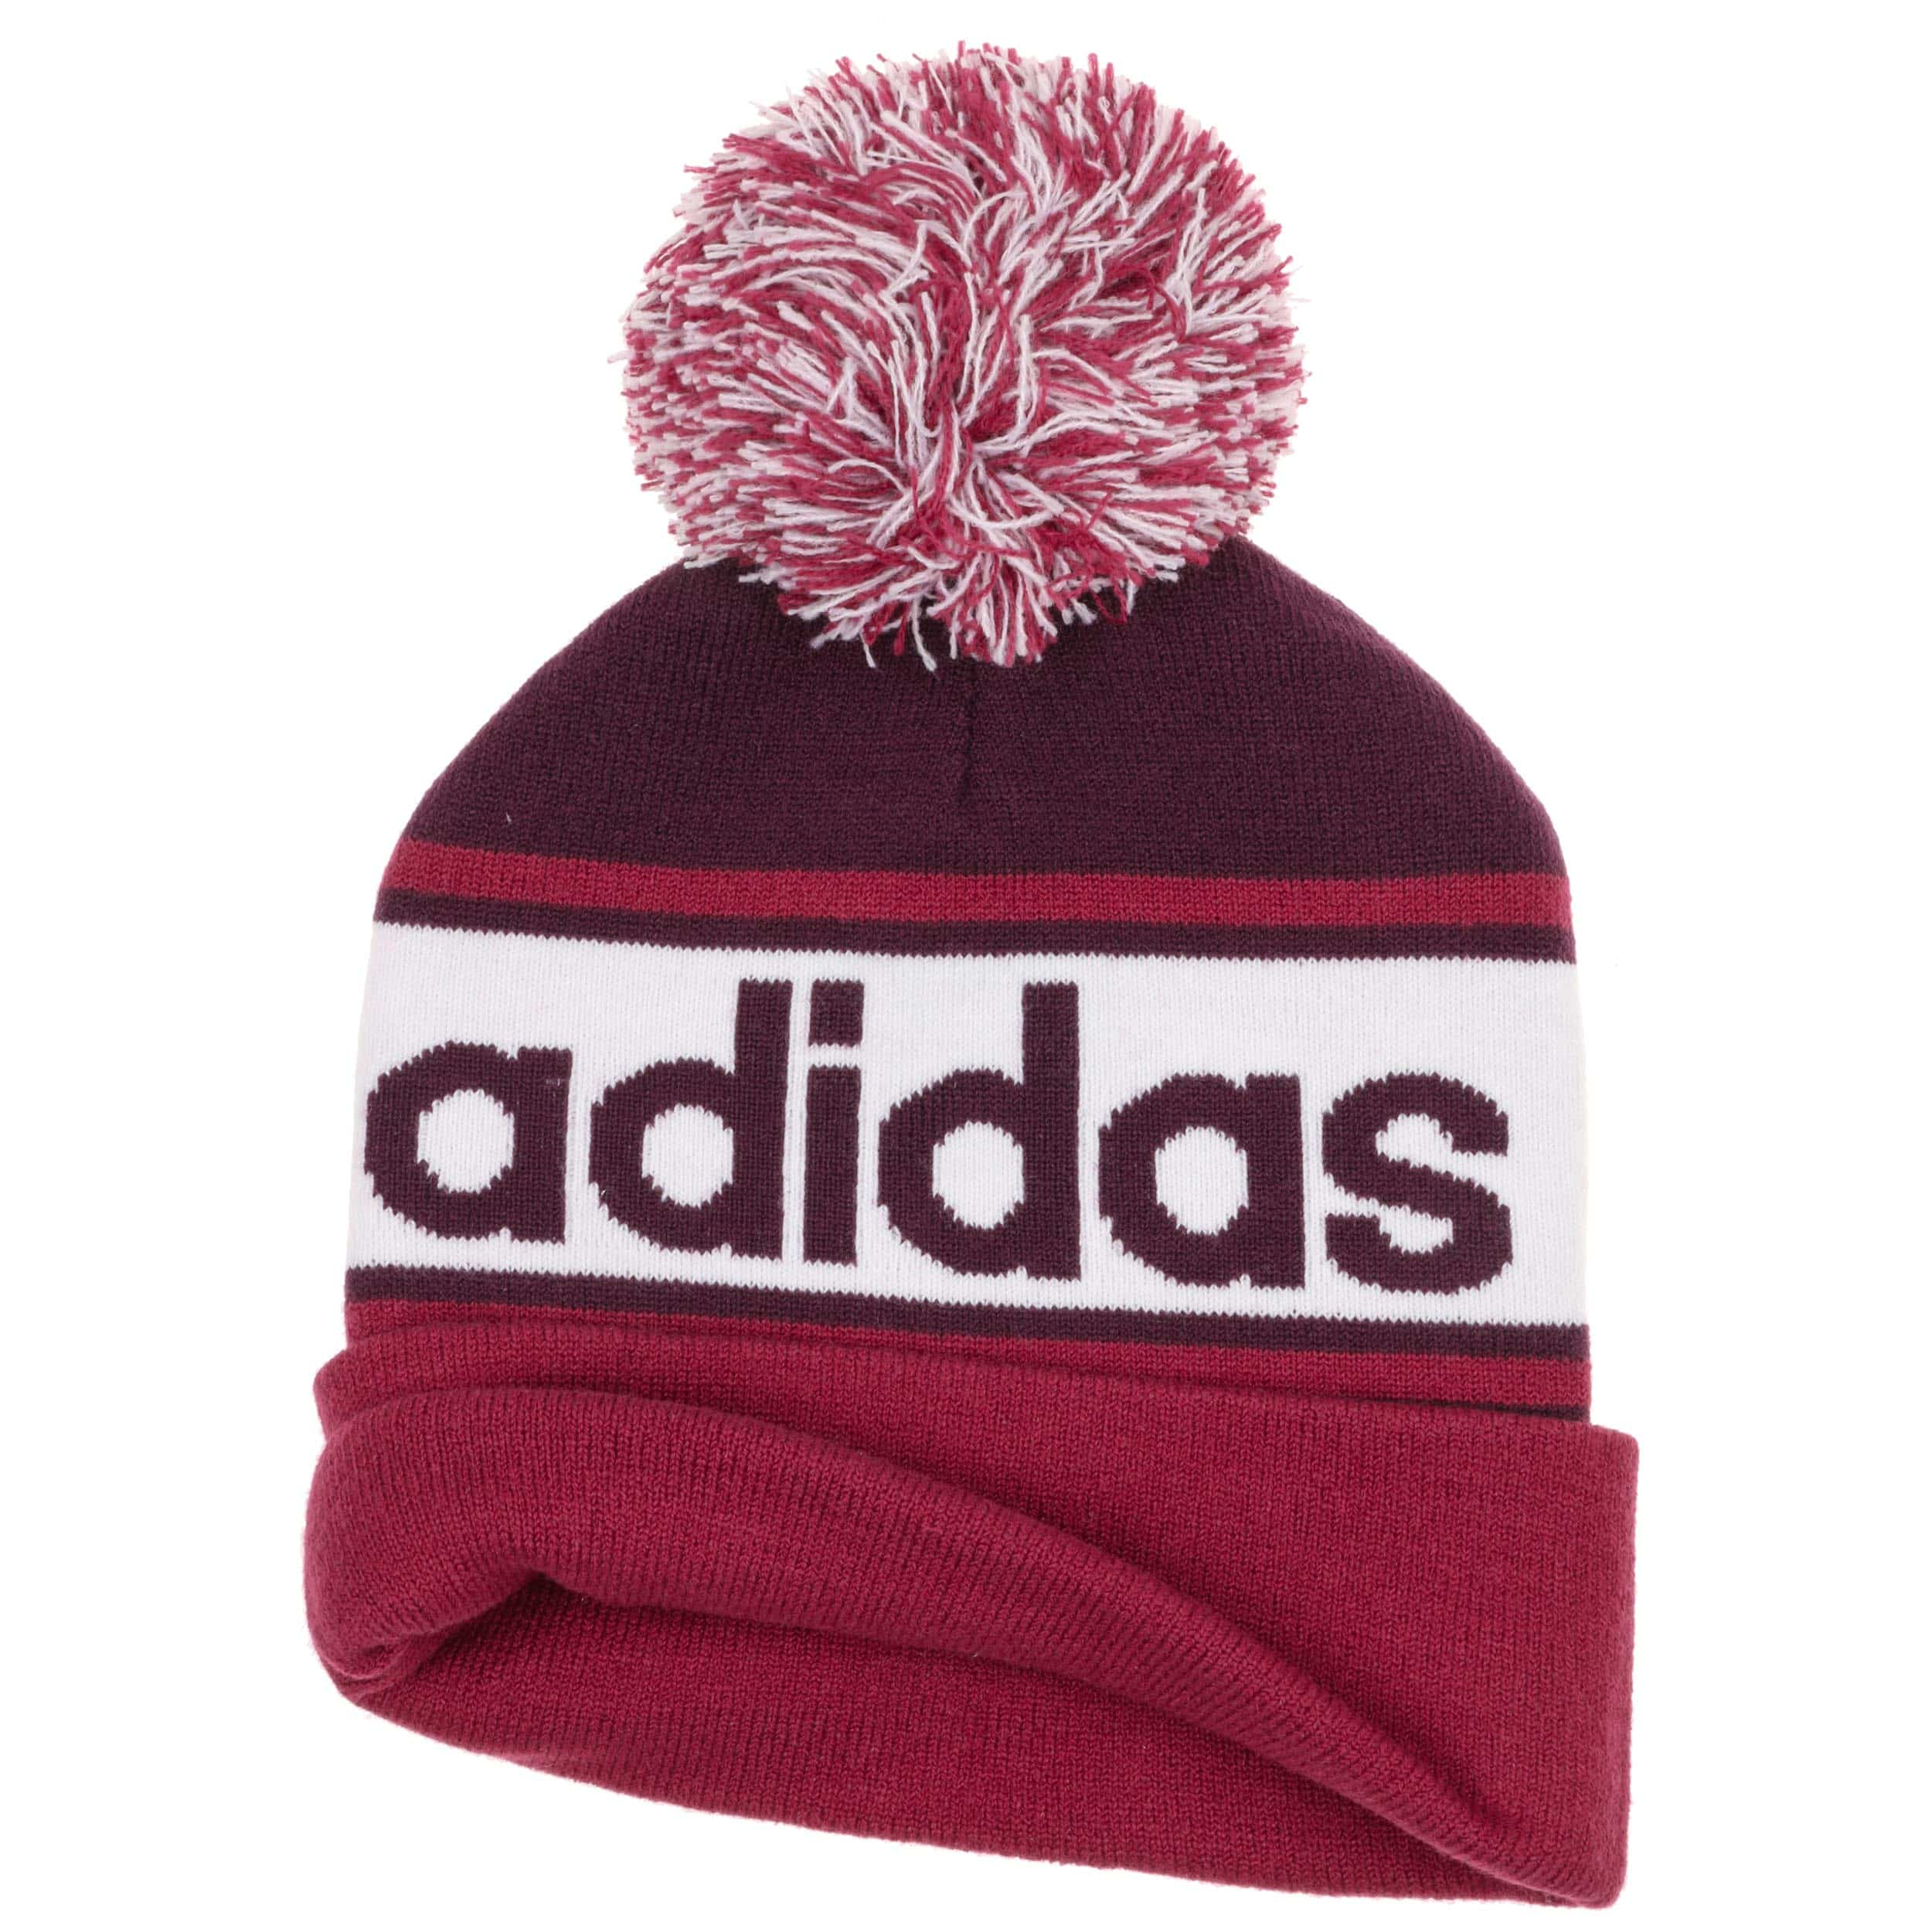 ... promo code for woolie beanie pompom hat by adidas 1 1da23 5aab2 cd985e37368b